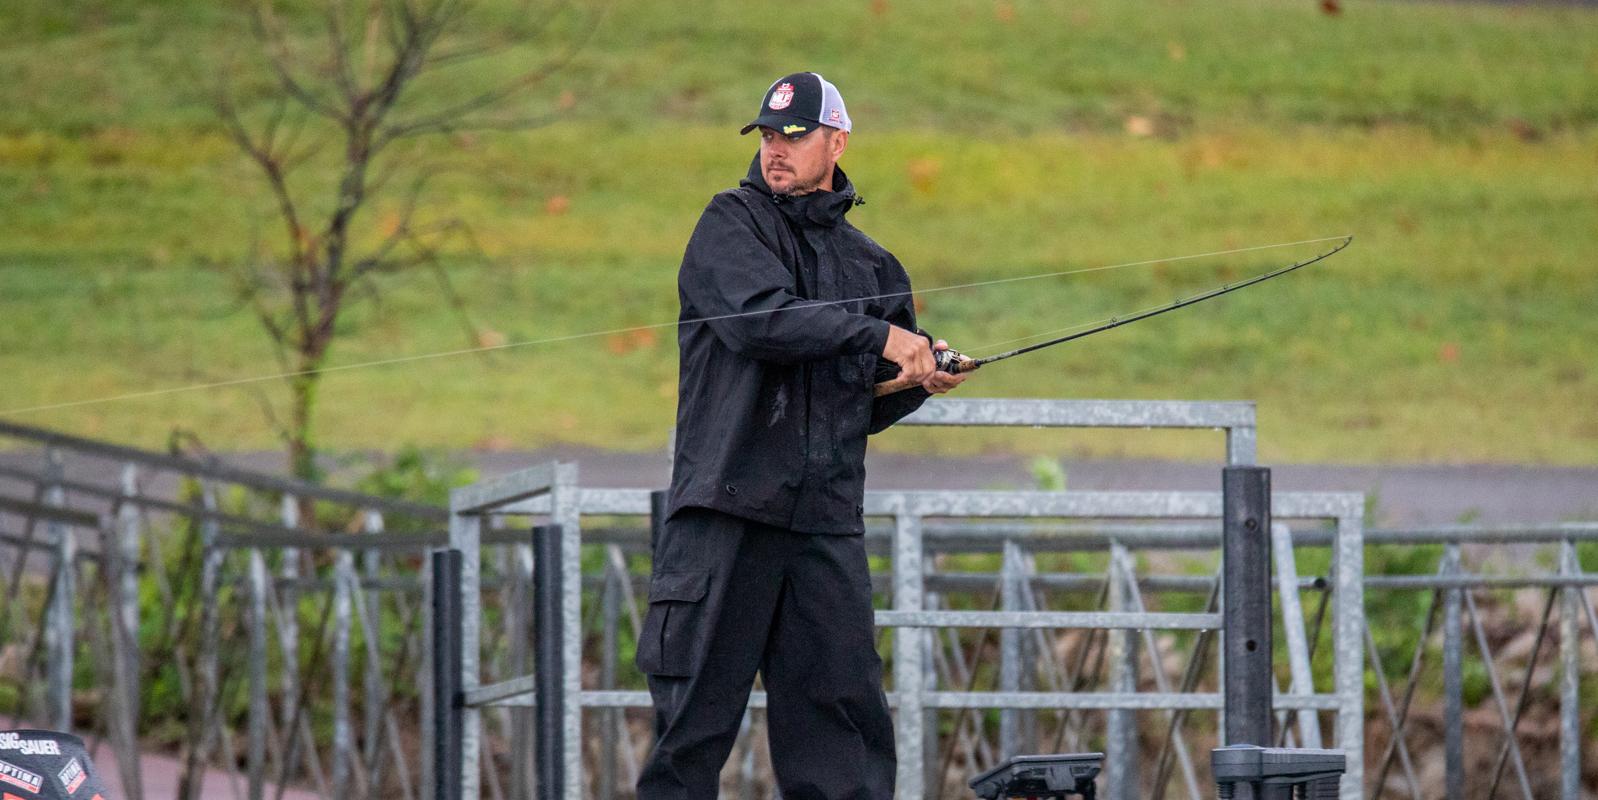 Major League Fishing pro Jason Christie